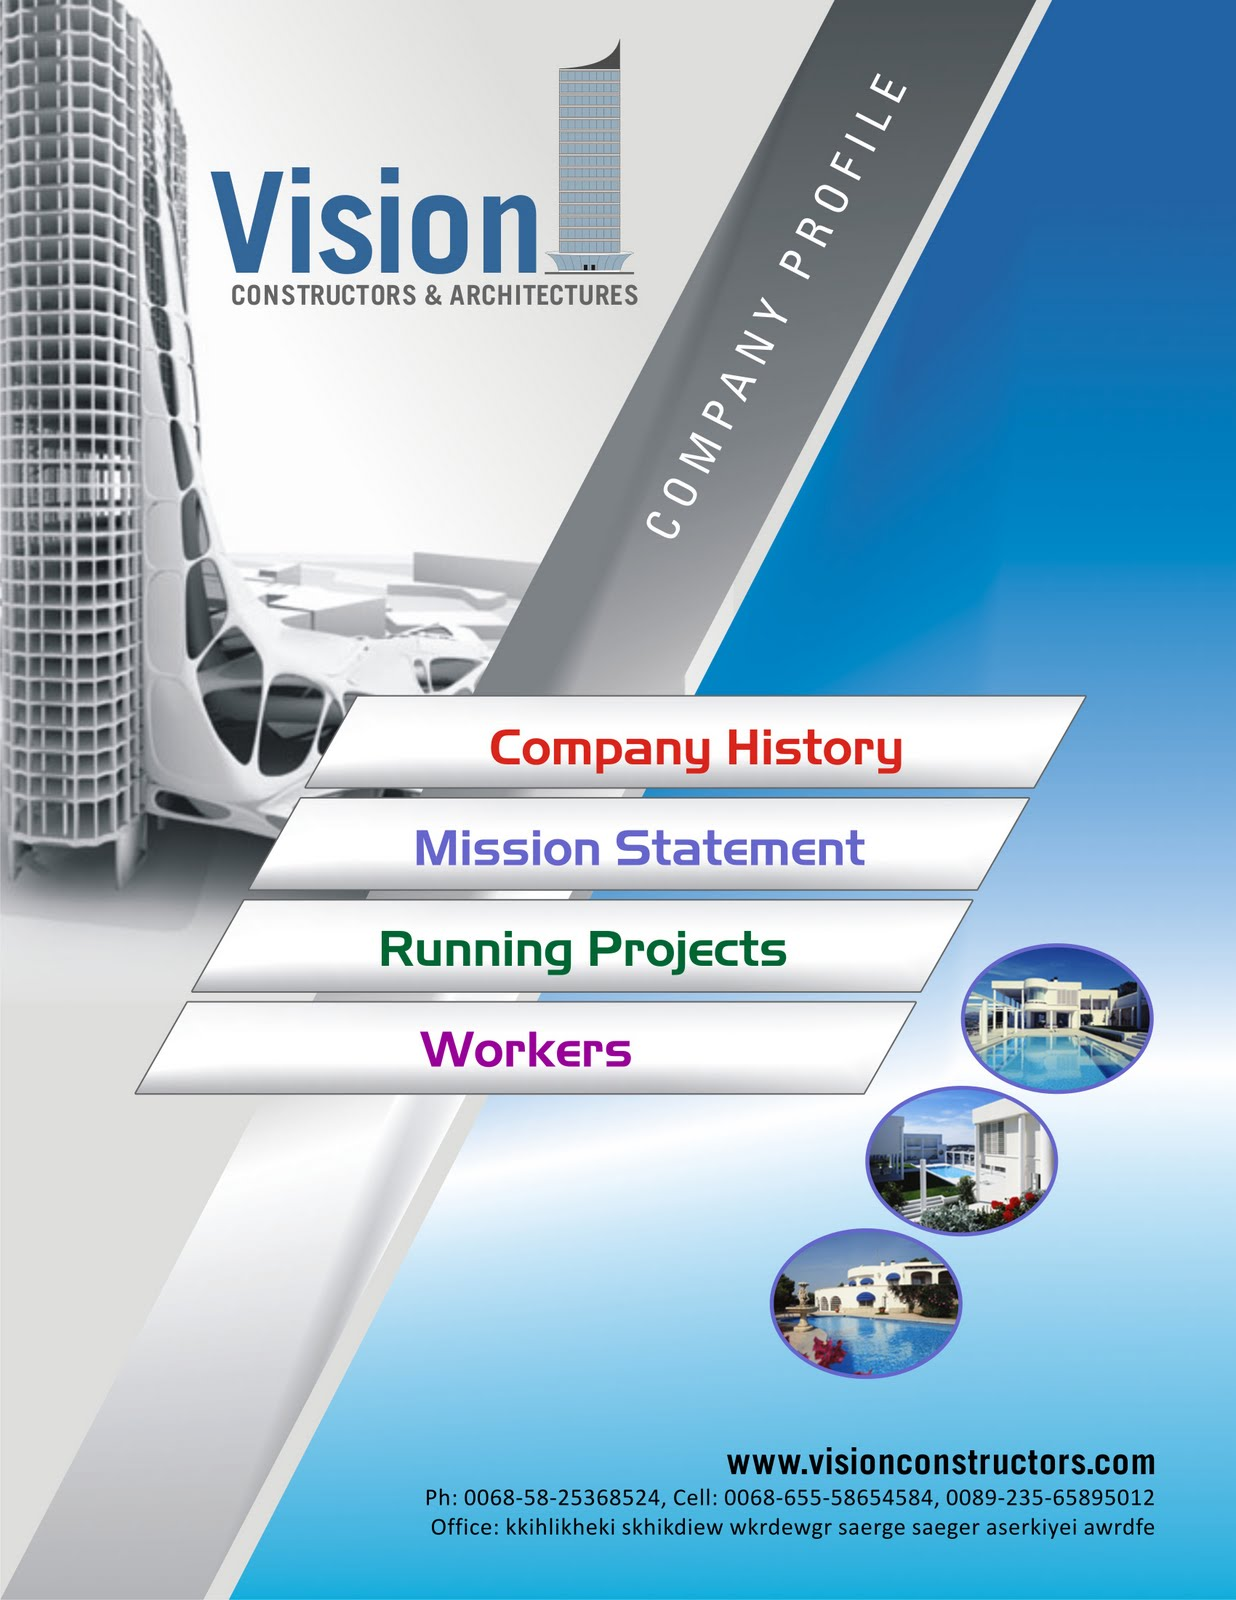 Amazingly Simple Graphic Design Software Canva Ammar Enterprises Pvt Ltd Company Profile Designs